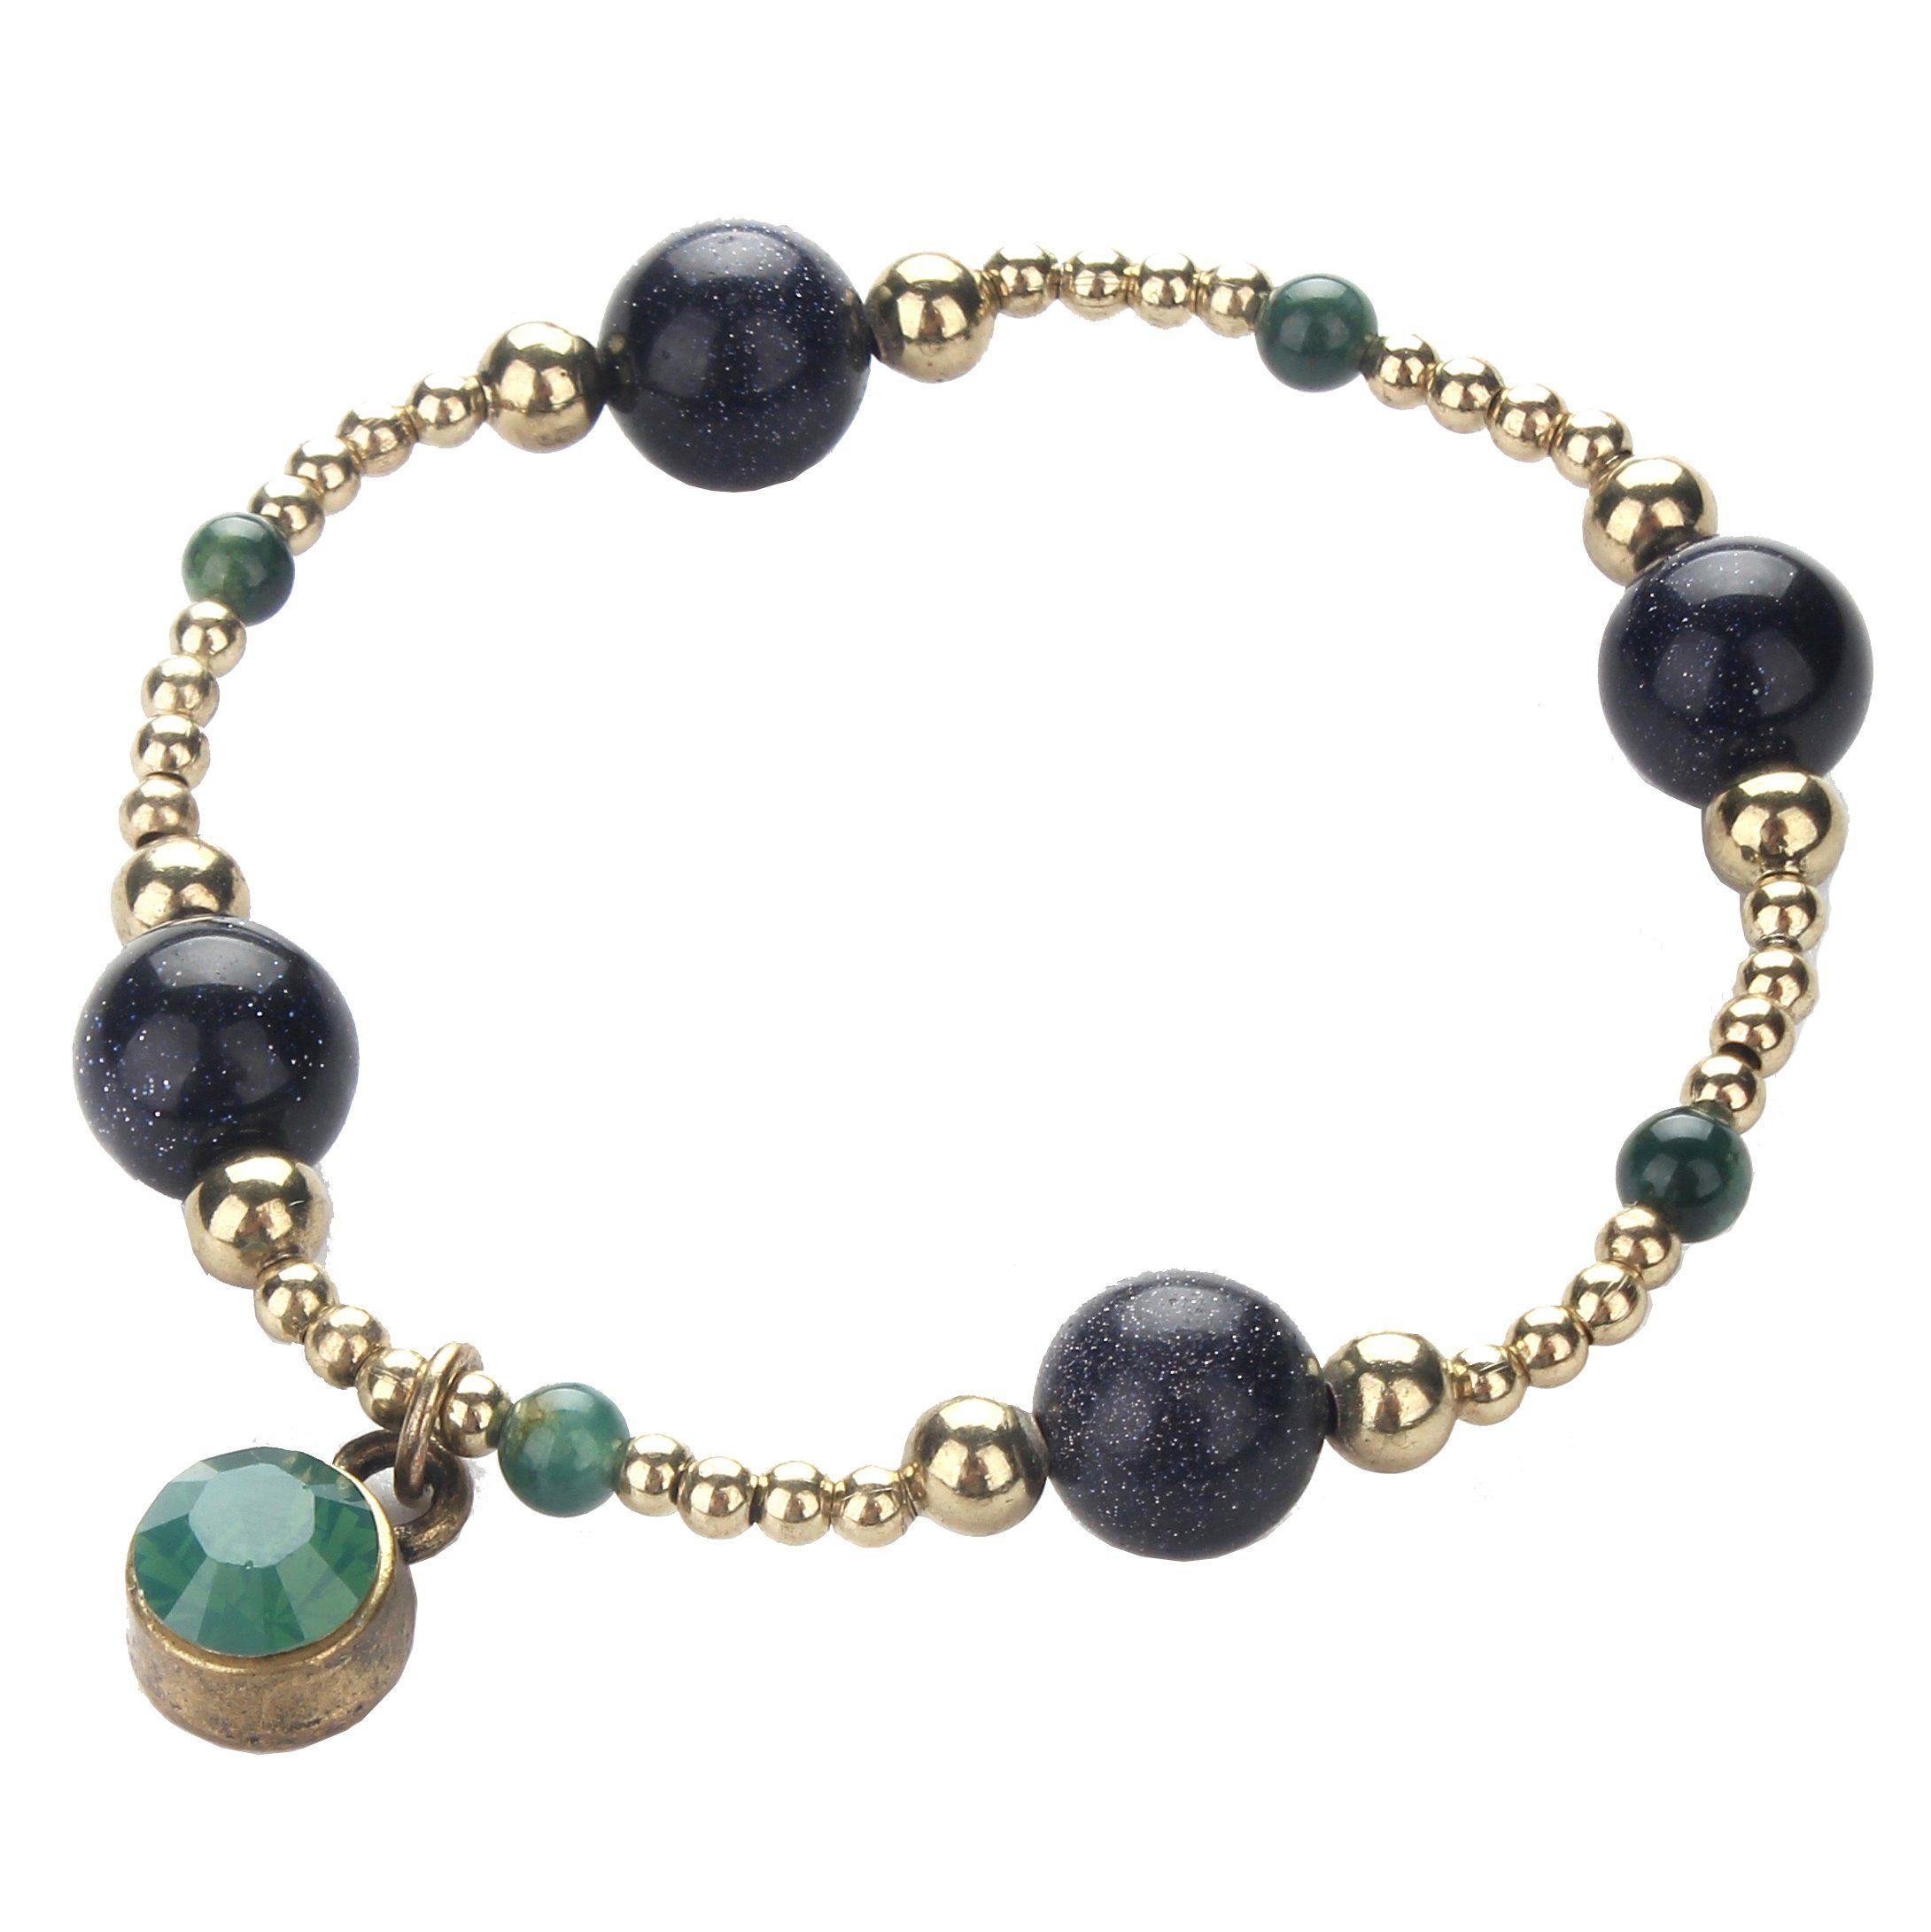 Girls novetly design k gold galaxy charm bracelets fashion jewelry